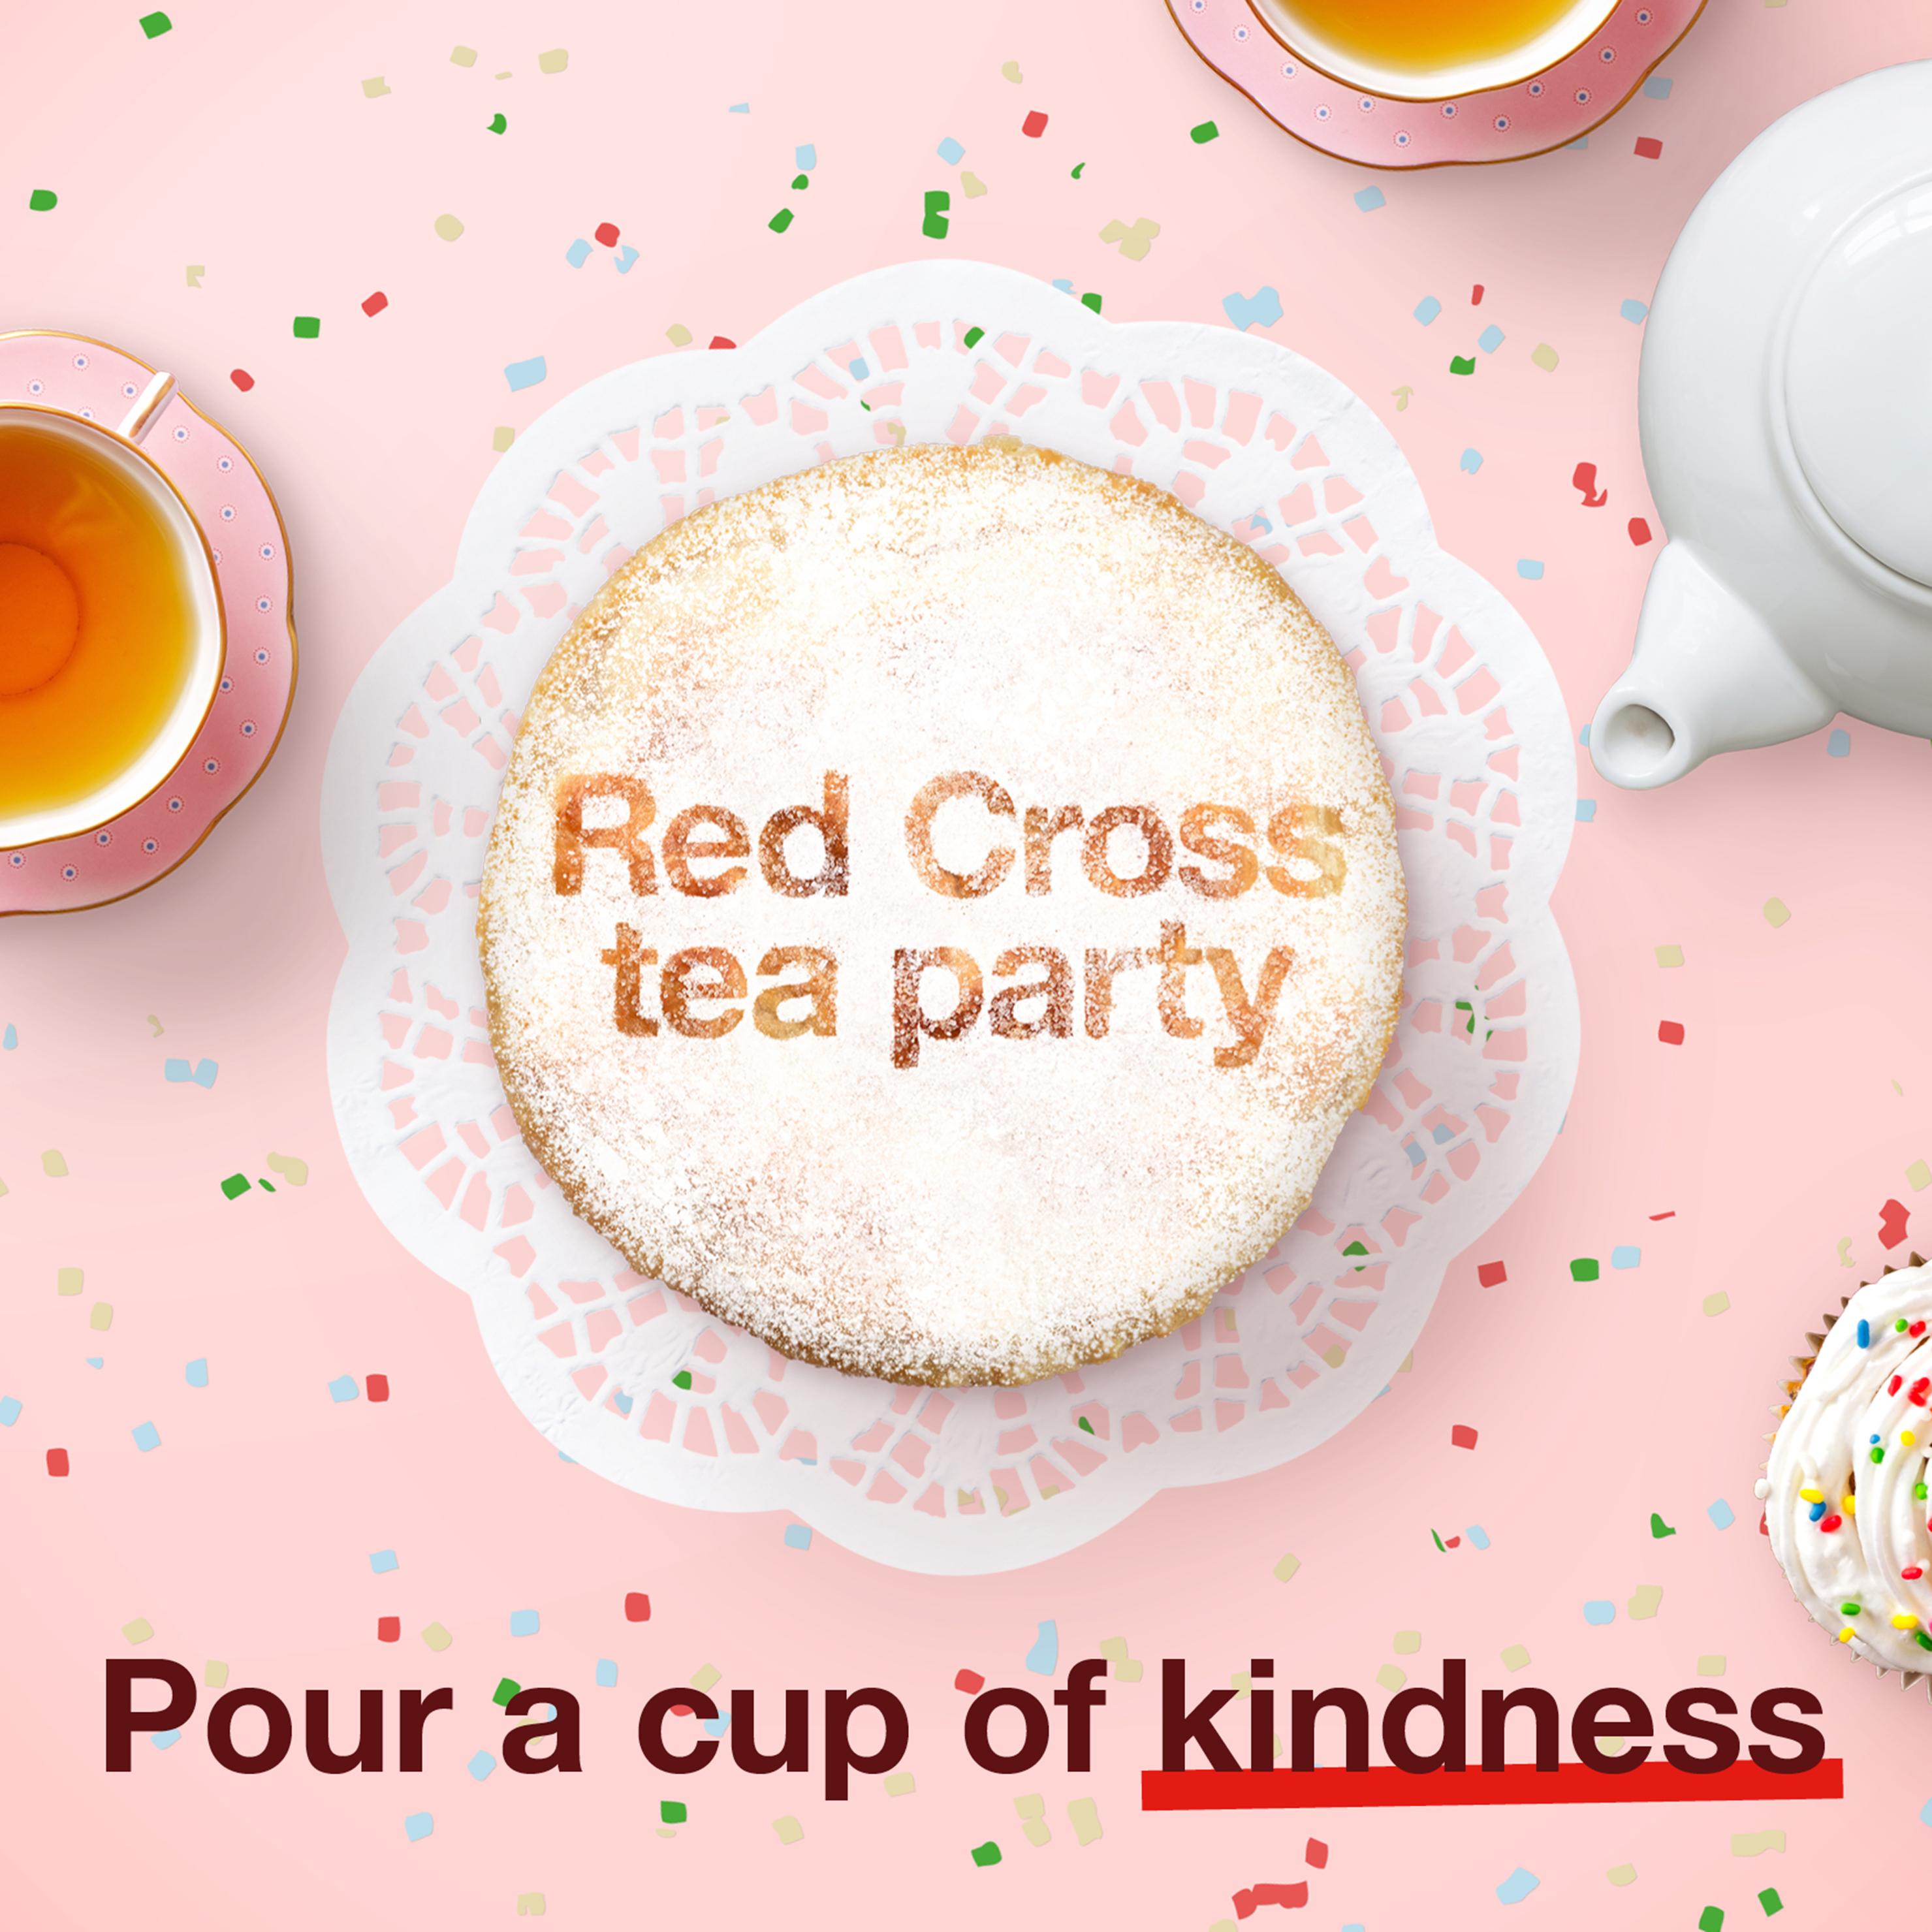 Red Cross tea party